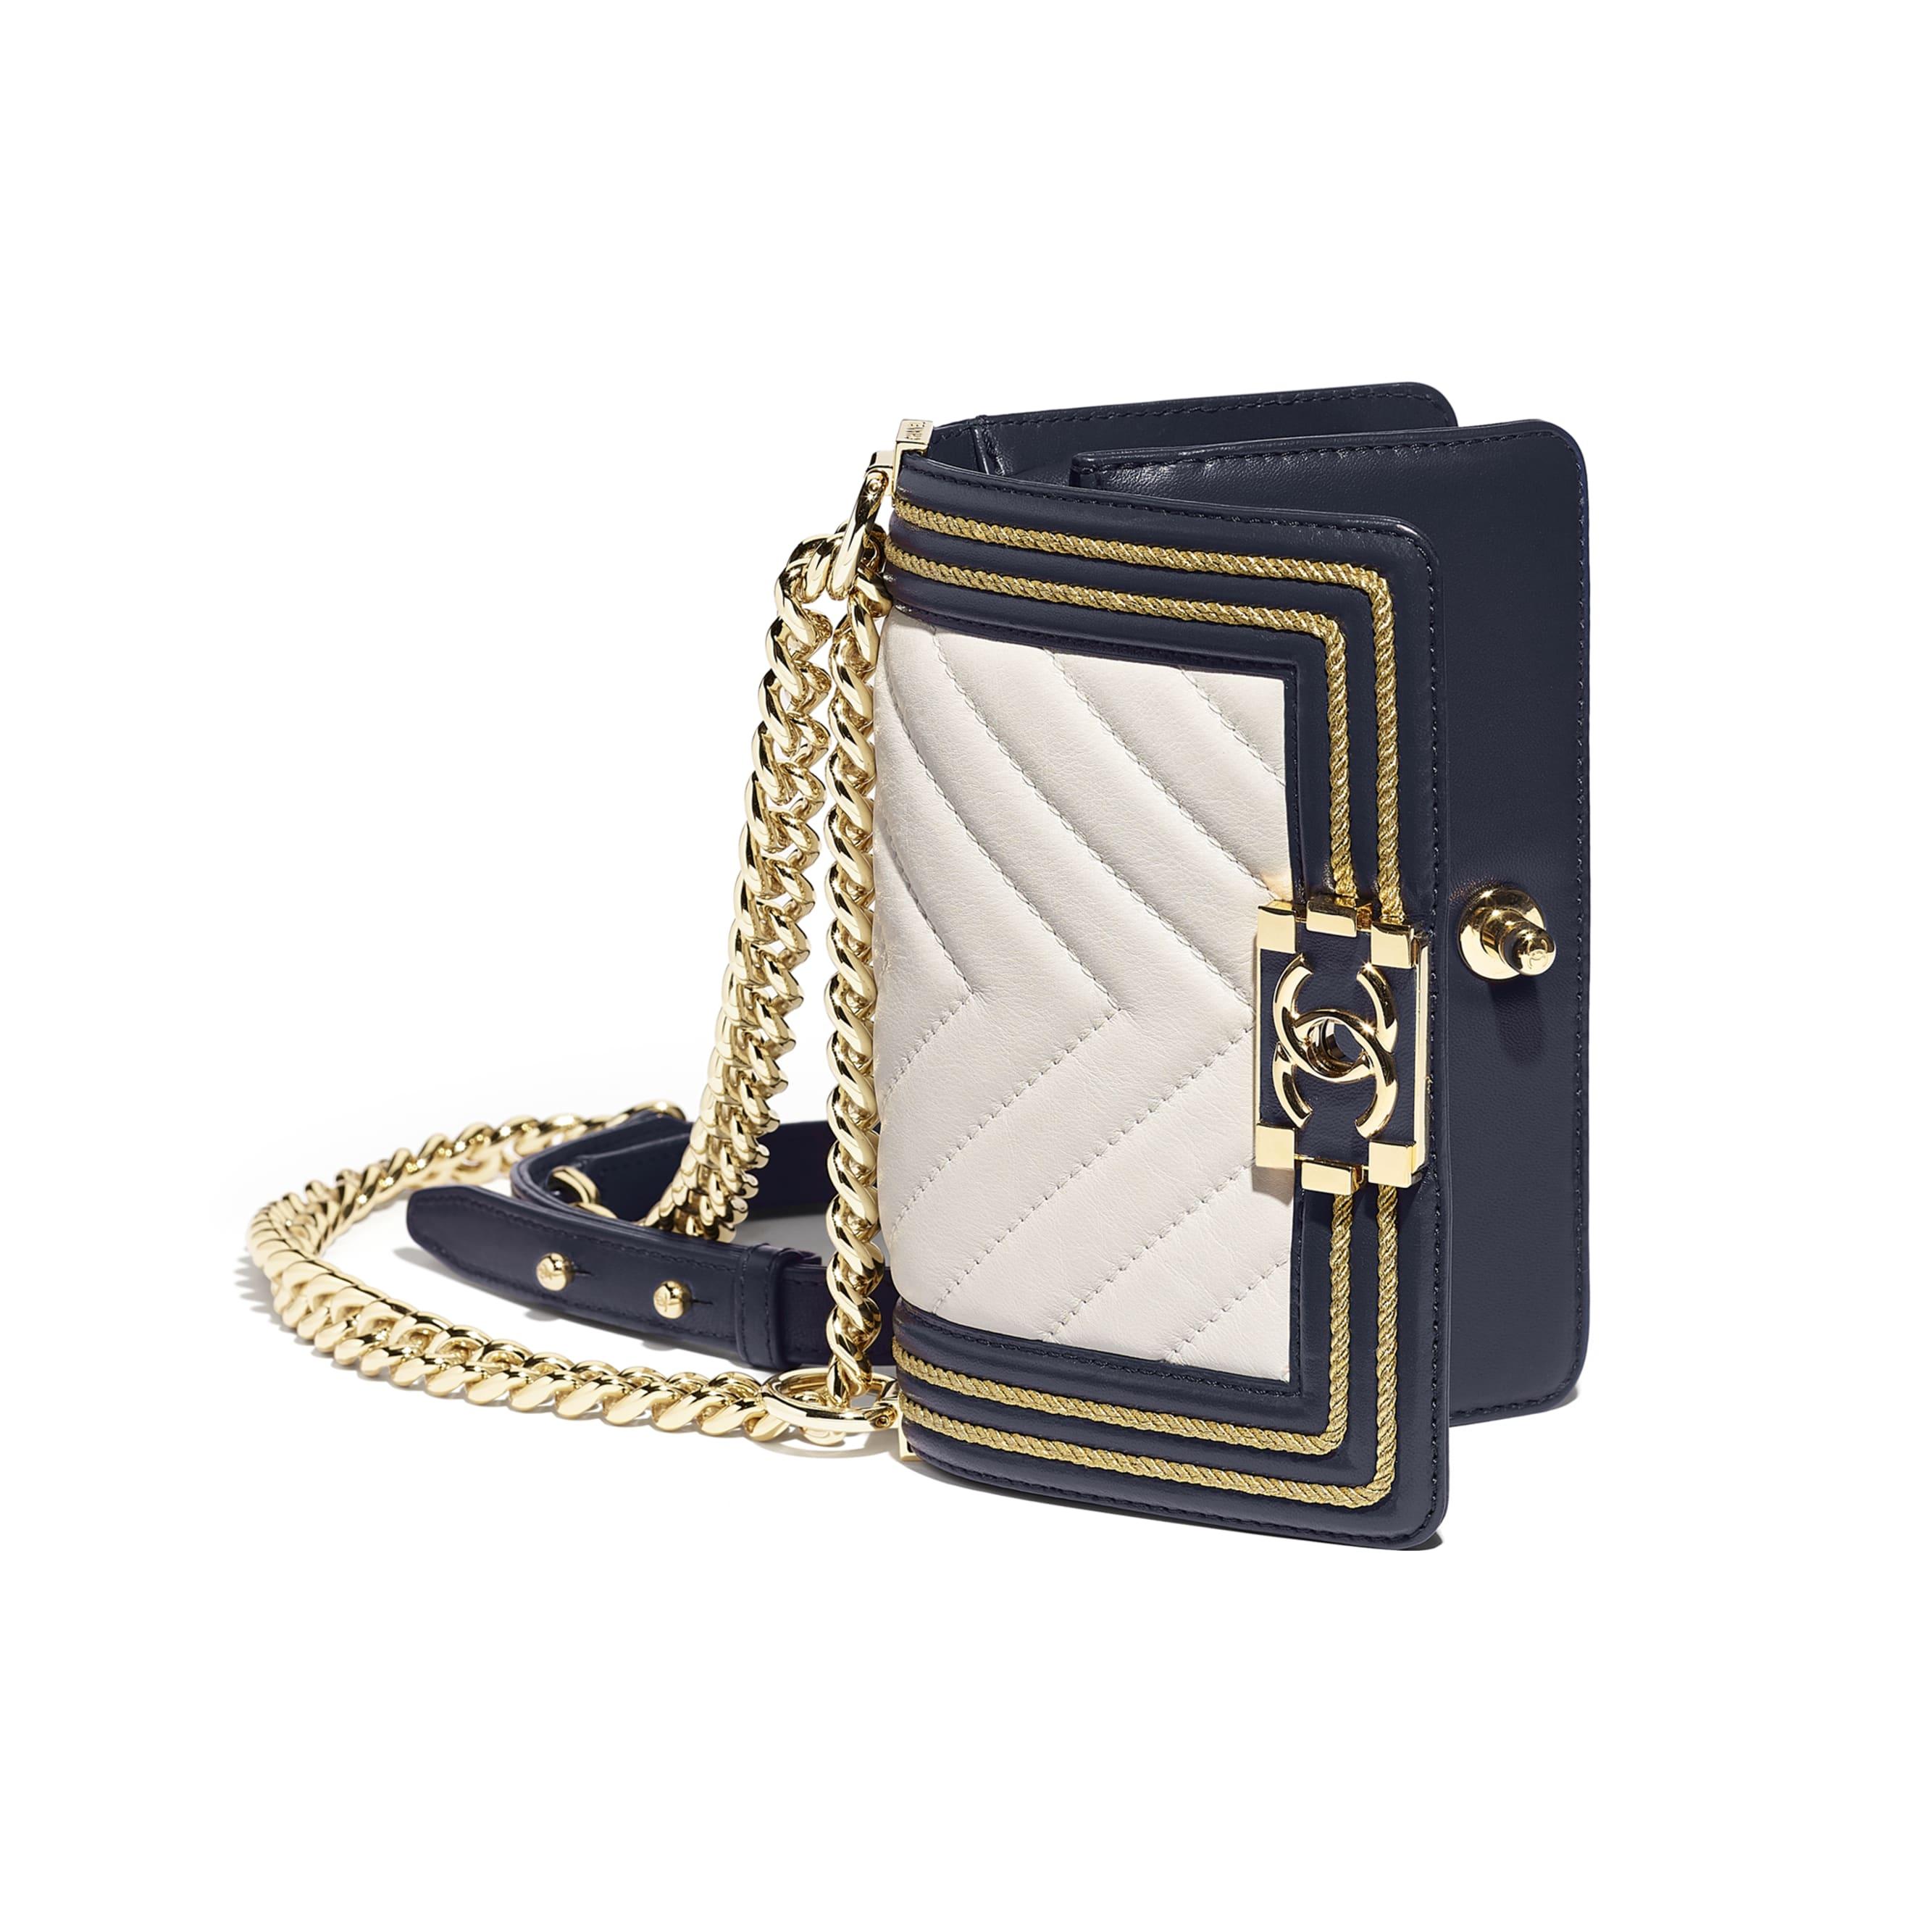 5cd7d16e175c ... Small BOY CHANEL Handbag - White   Navy Blue - Calfskin